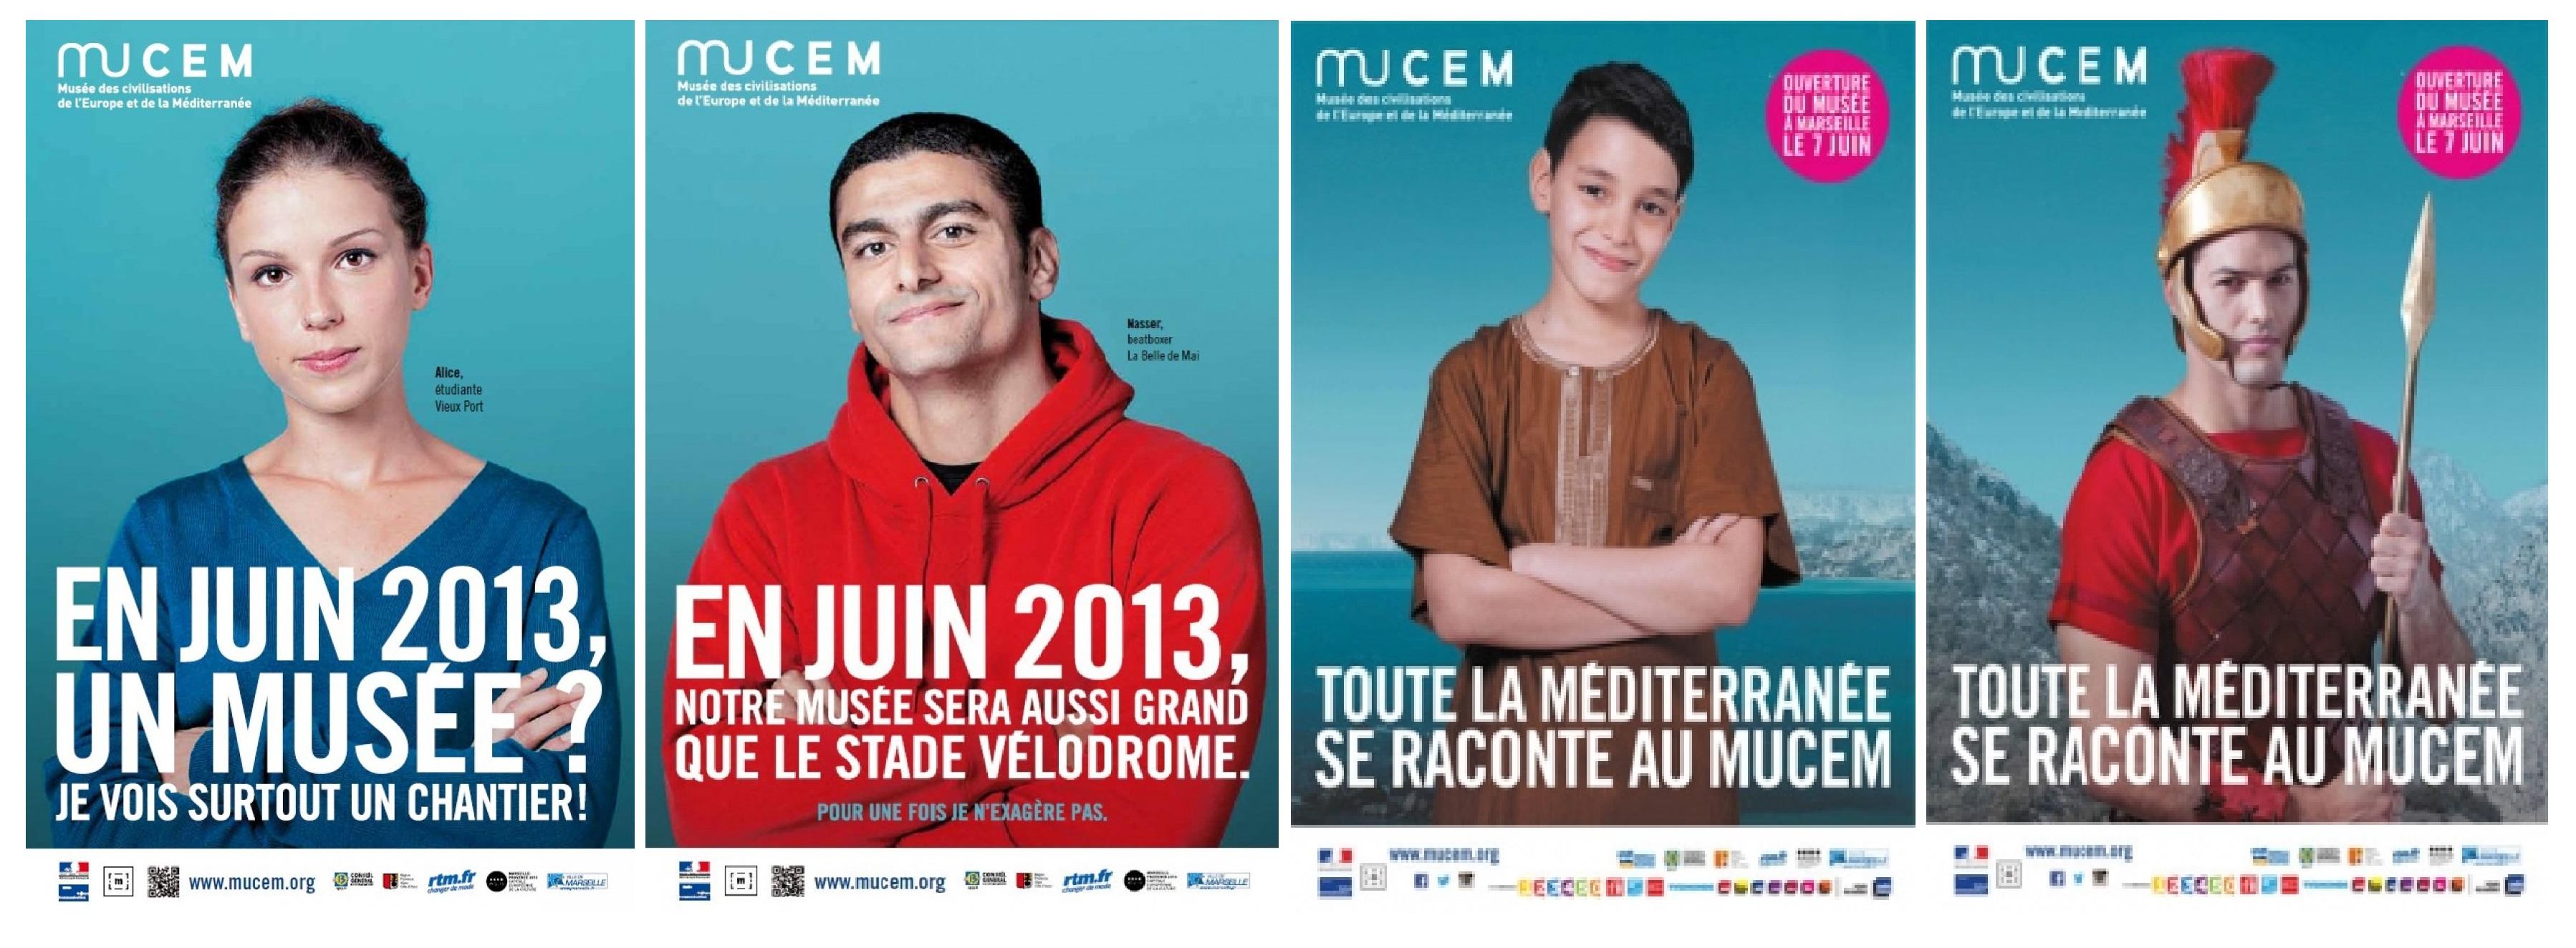 campagnemucem_alice